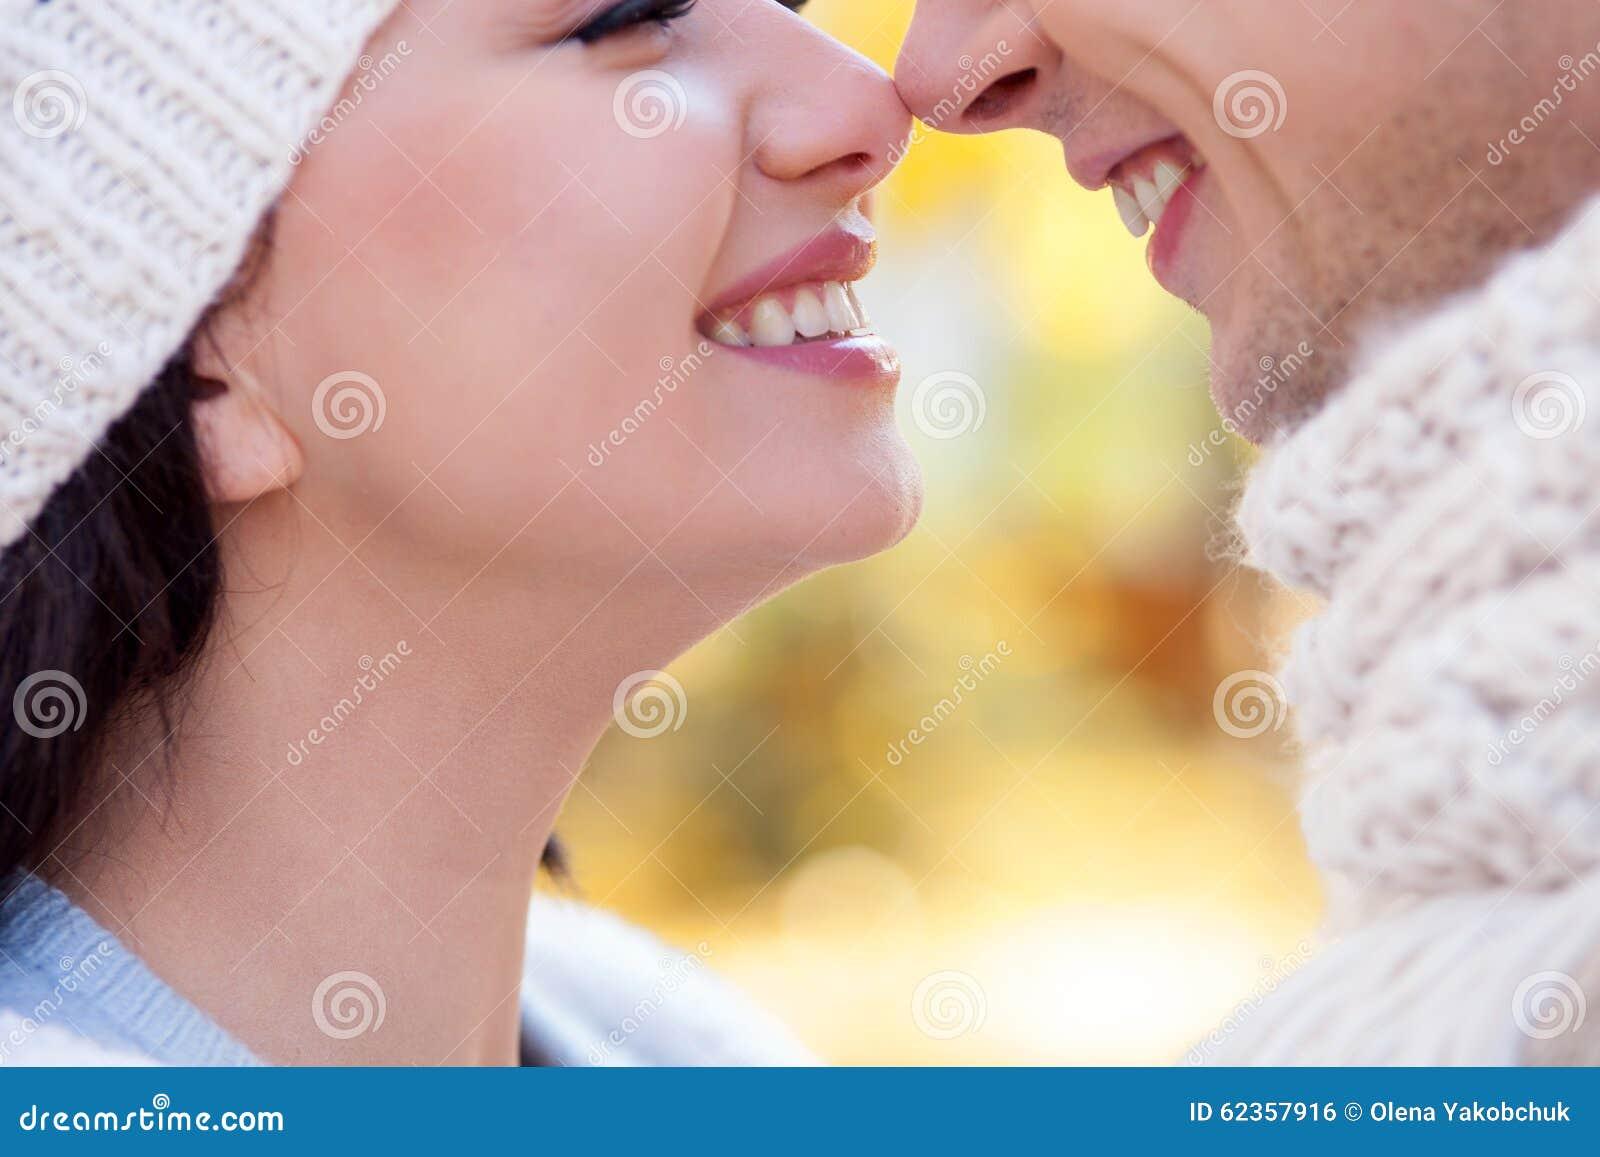 Greenbelt nopeus dating 2013